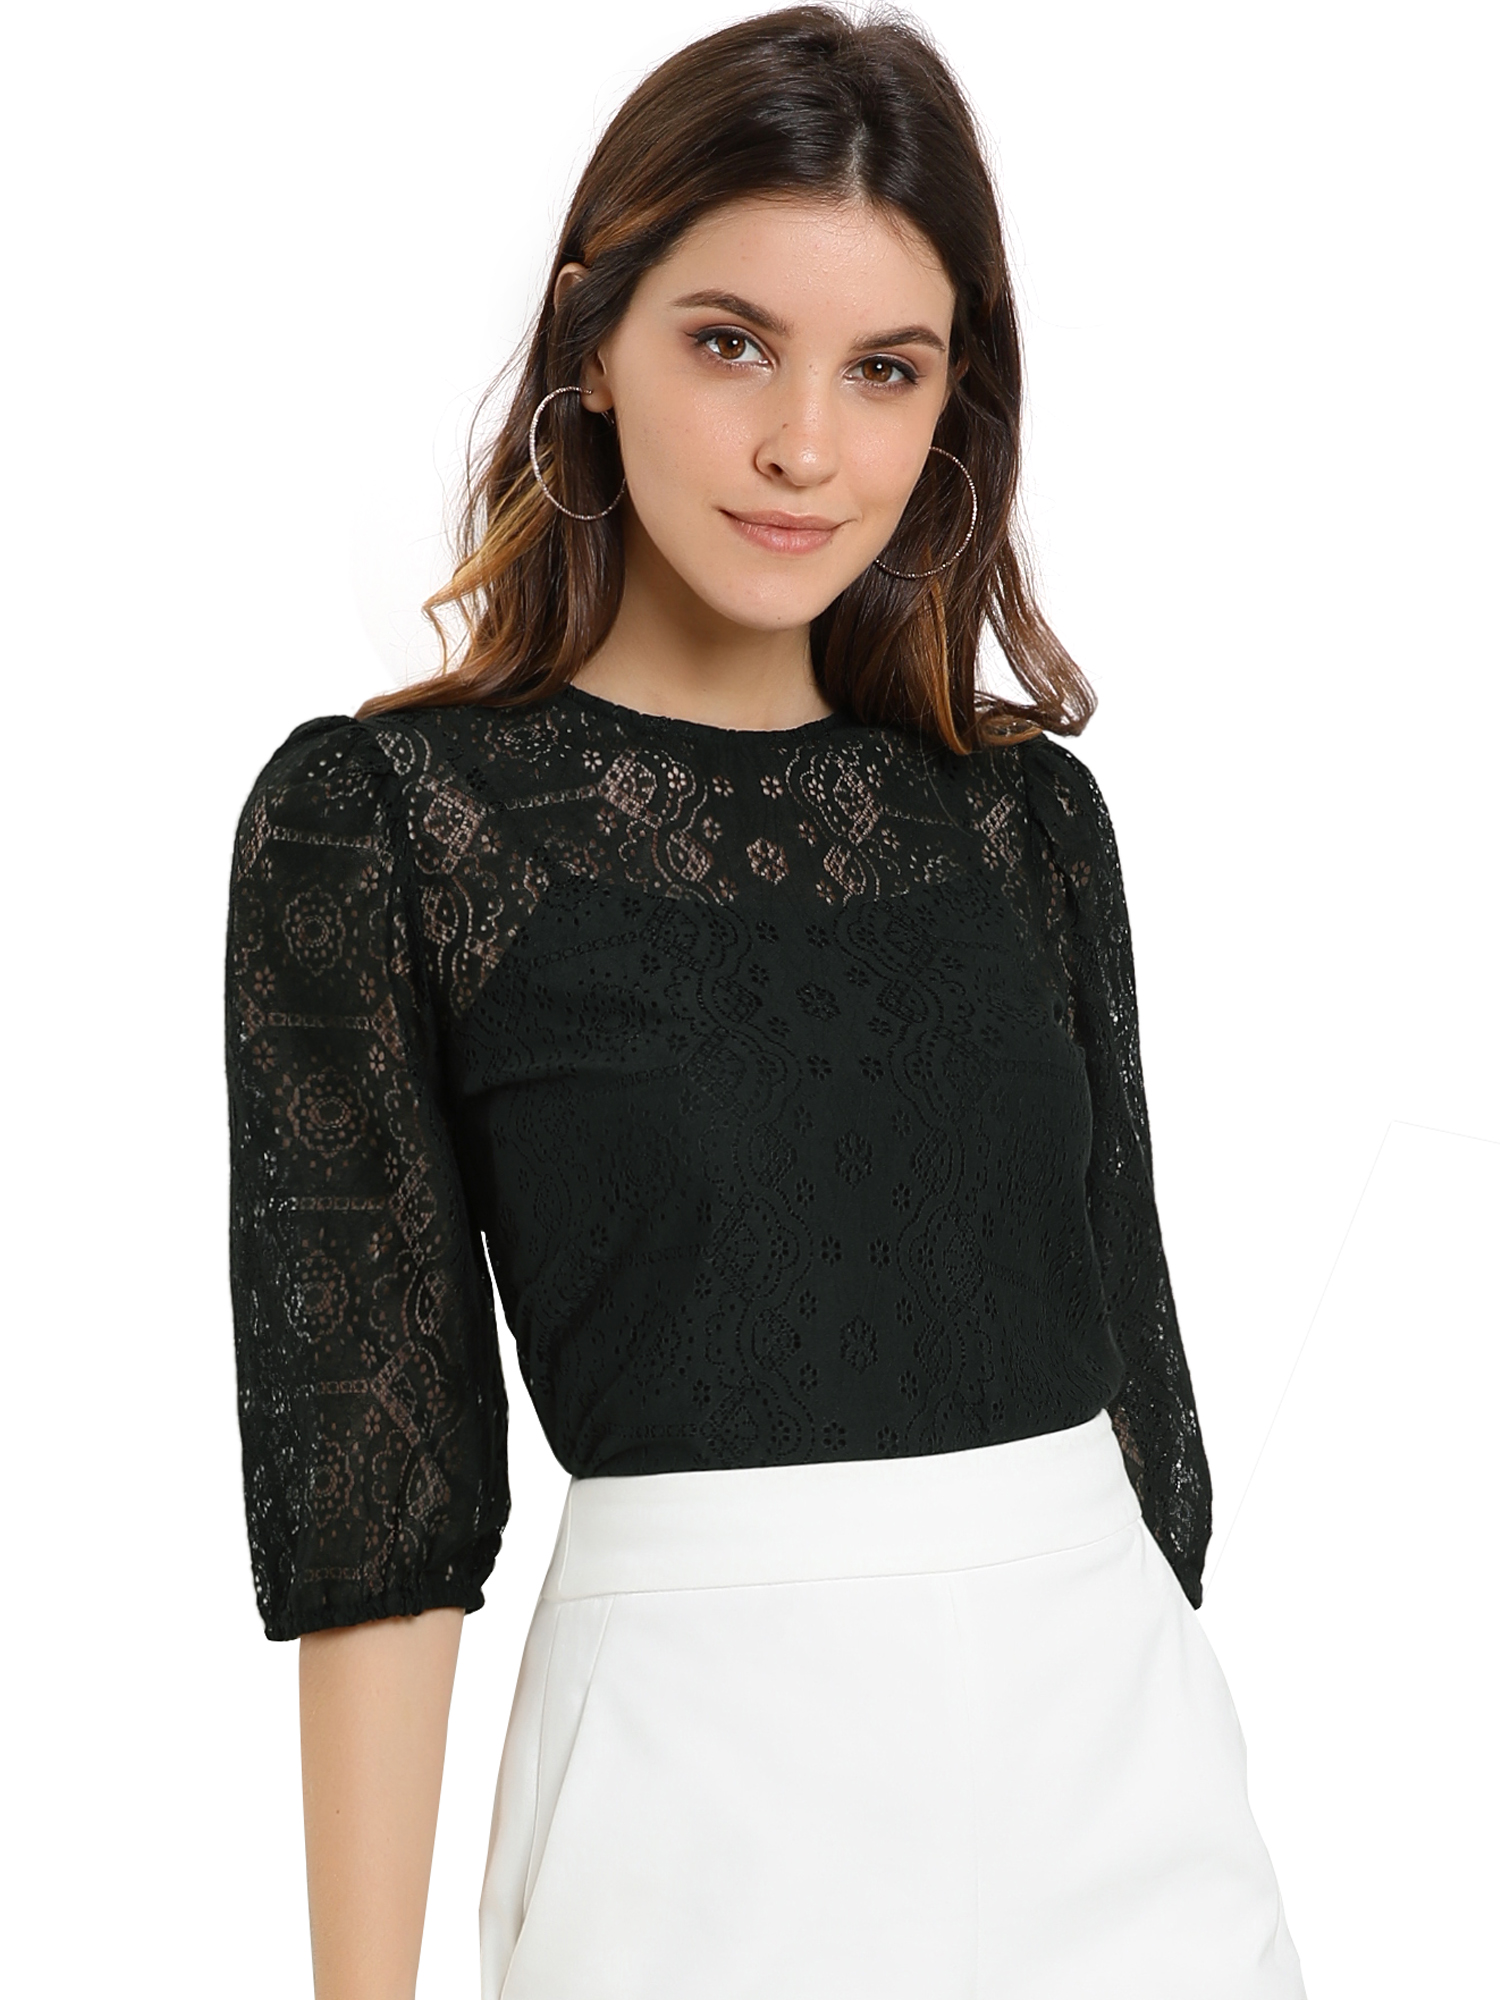 Allegra K Women's 3/4 Lantern Sleeve Semi Sheer Vintage Lace Tops Black L